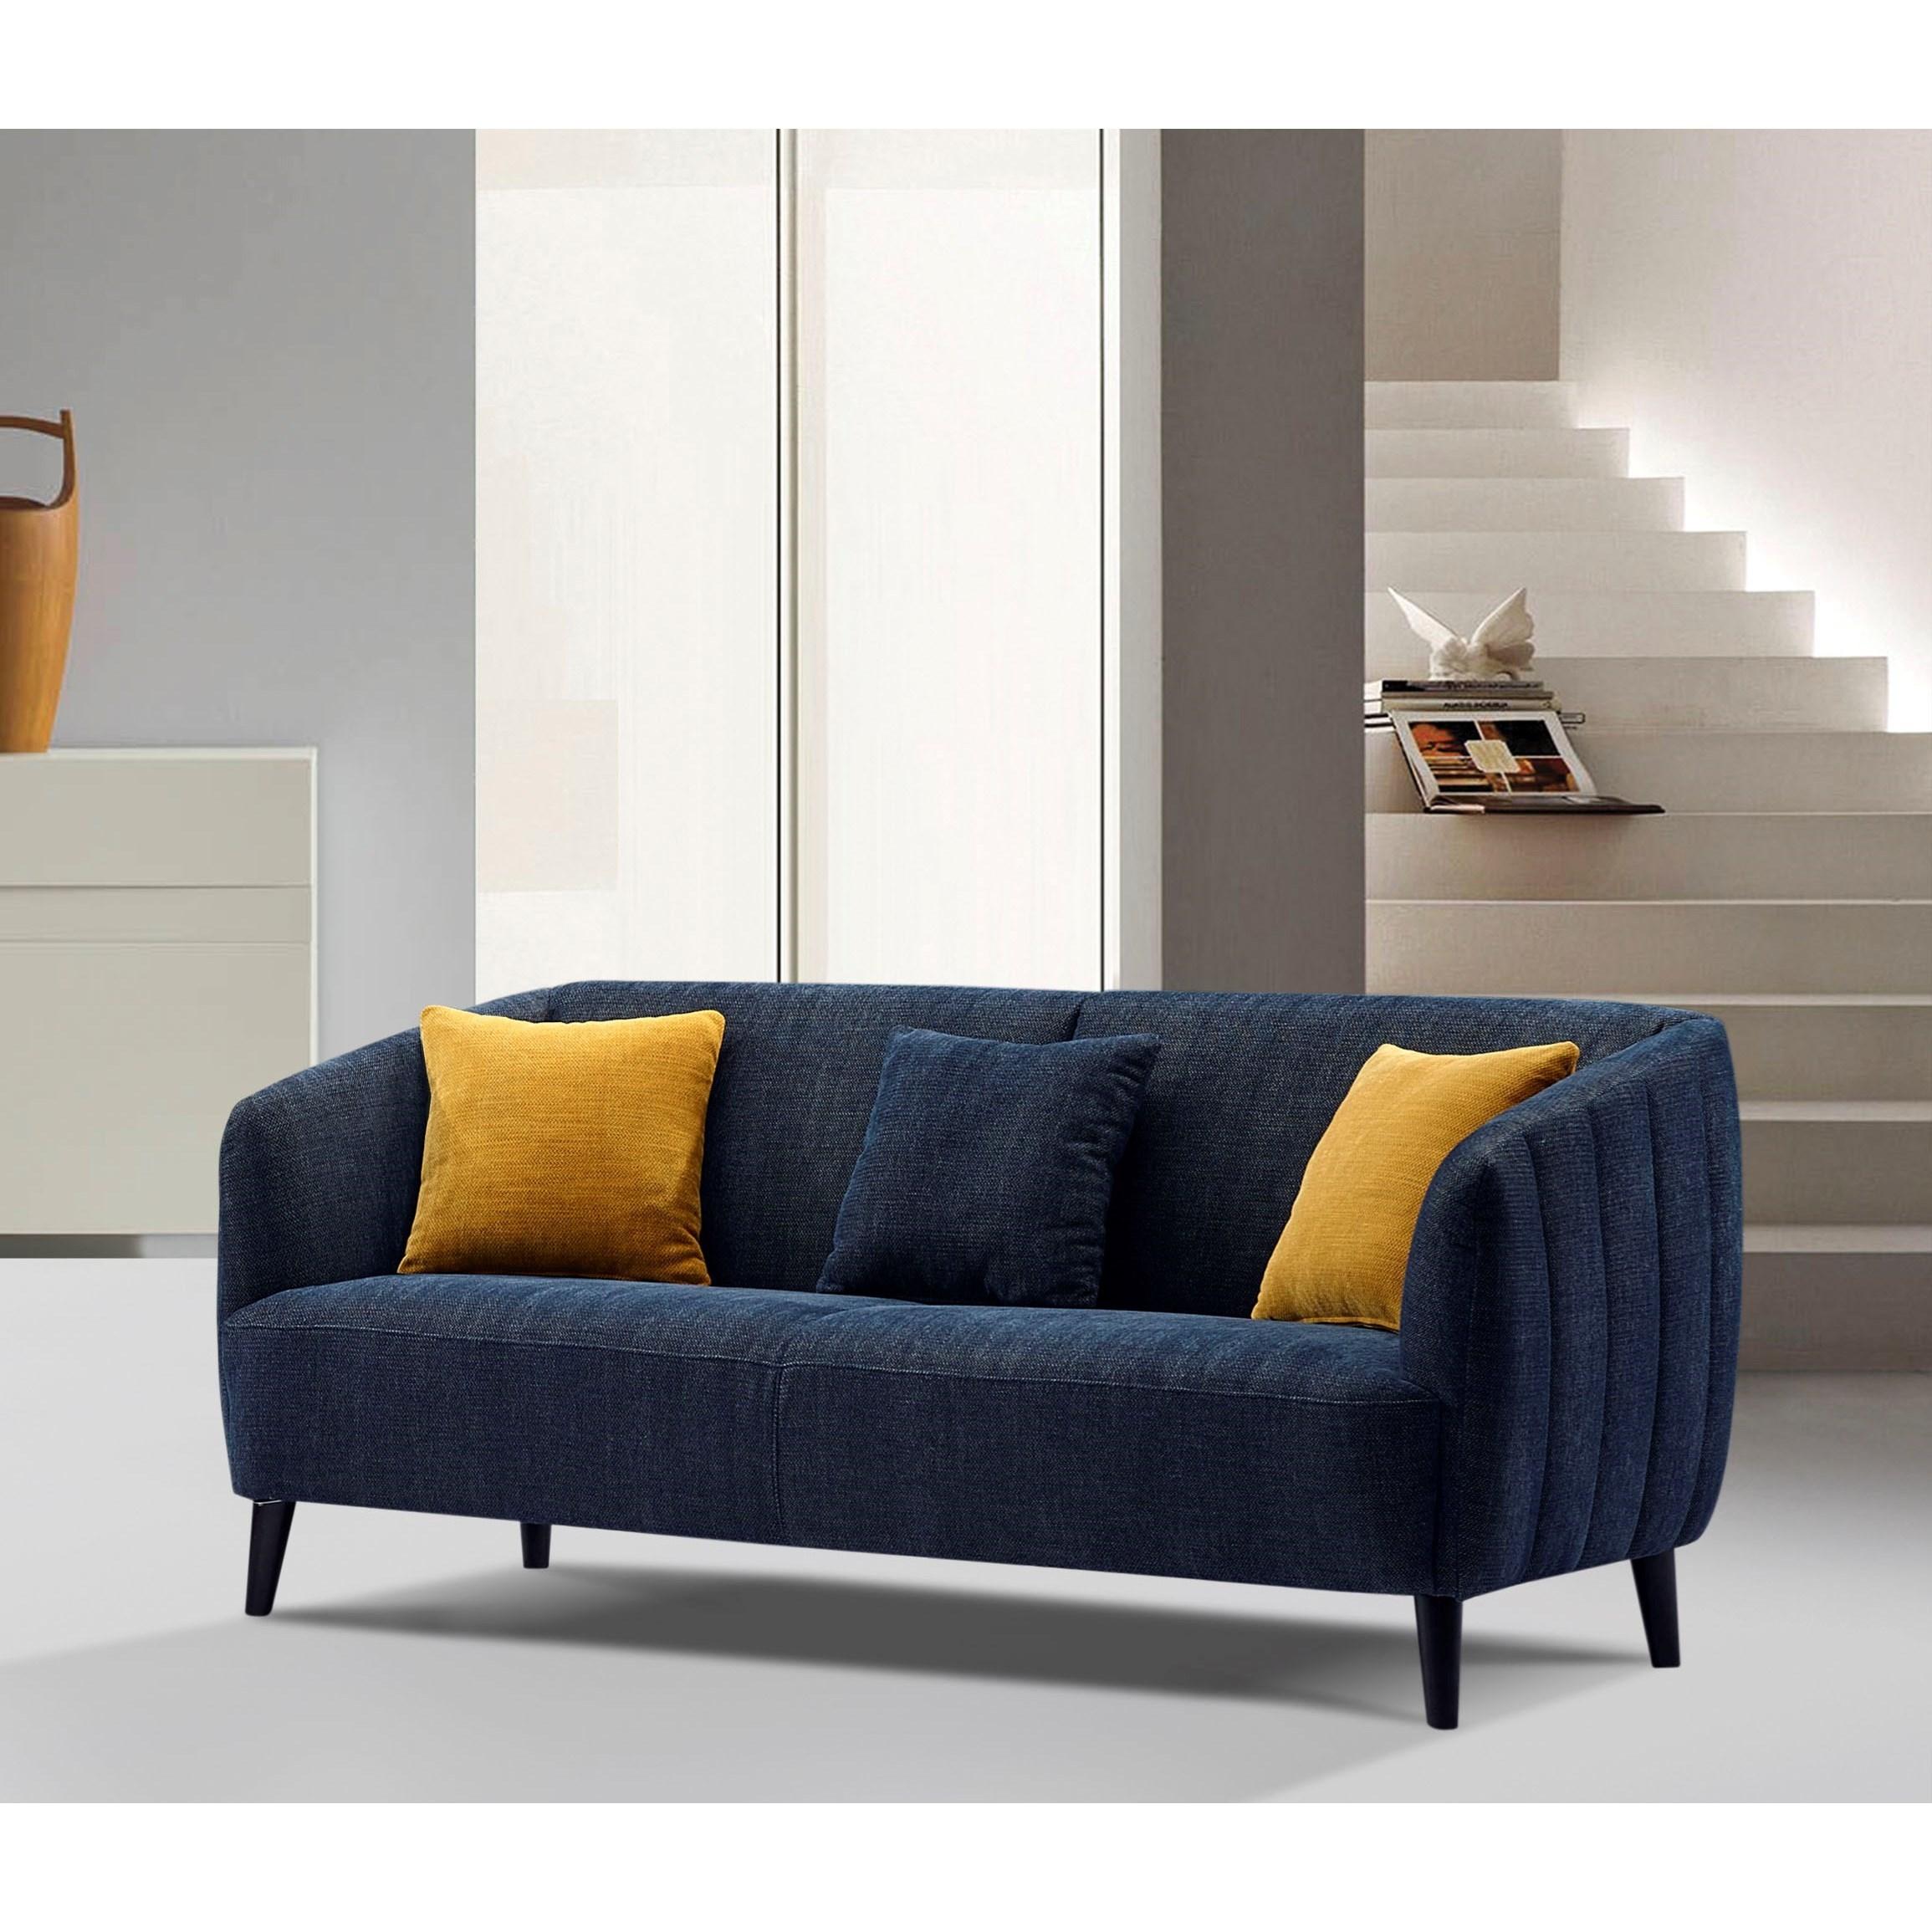 angled sofa legs 2 piece sectional leather diamond de luca delucasobu modern with